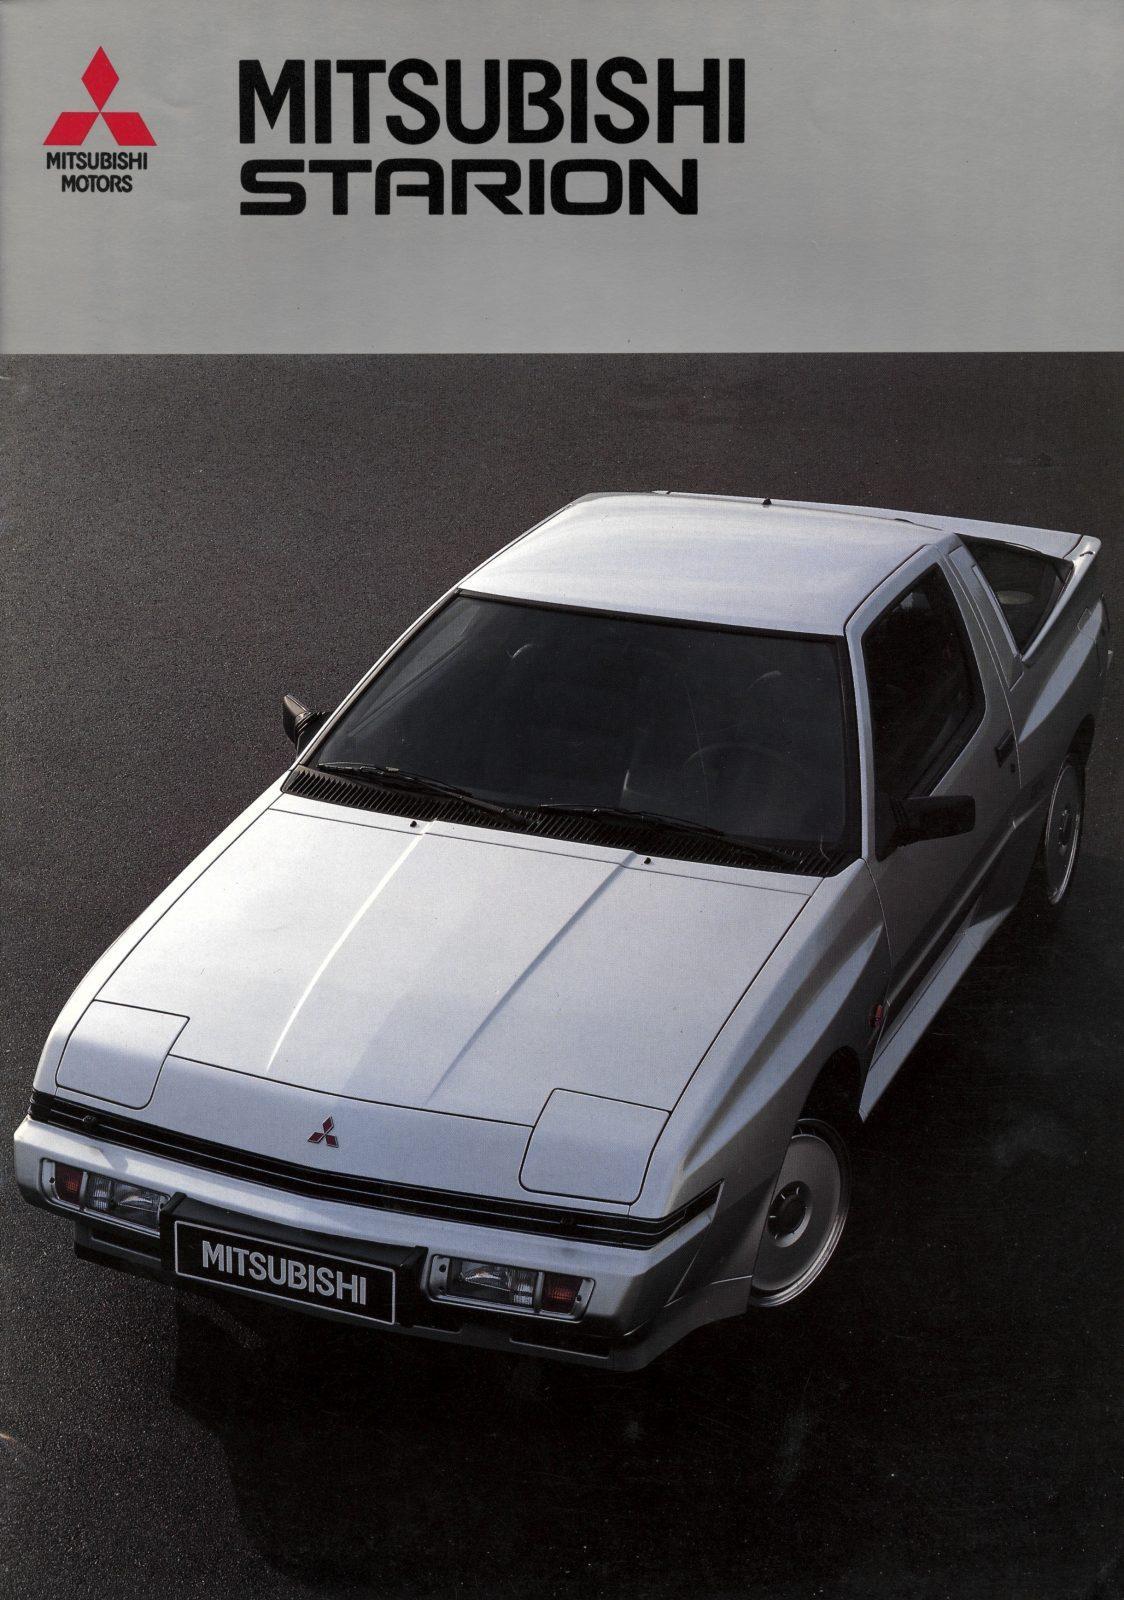 Mitsubishi folder